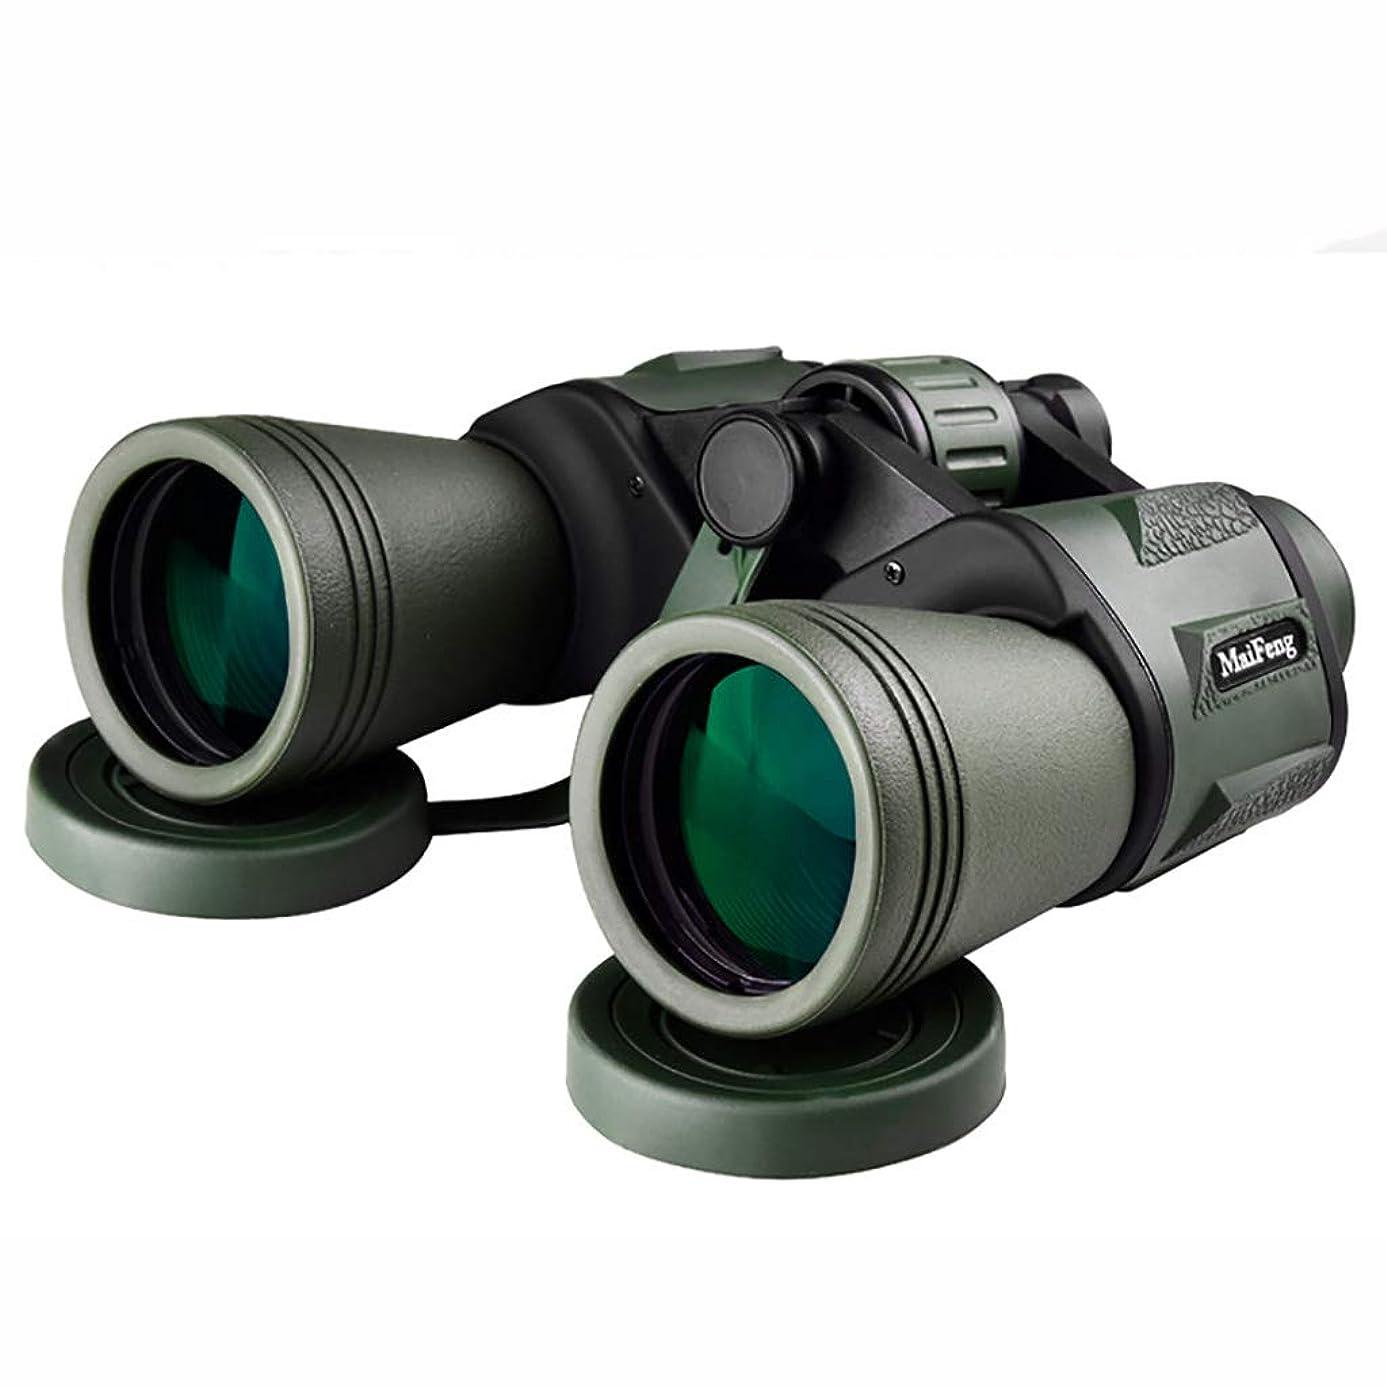 RUIJING Binoculars 20x50, Adult Hd Concert Low Light Level Night Vision Binoculars, Zoom, 22mm Large Eyepiece, 50mm Large Objective Lens, Waterproof, Fogproof Binoculars